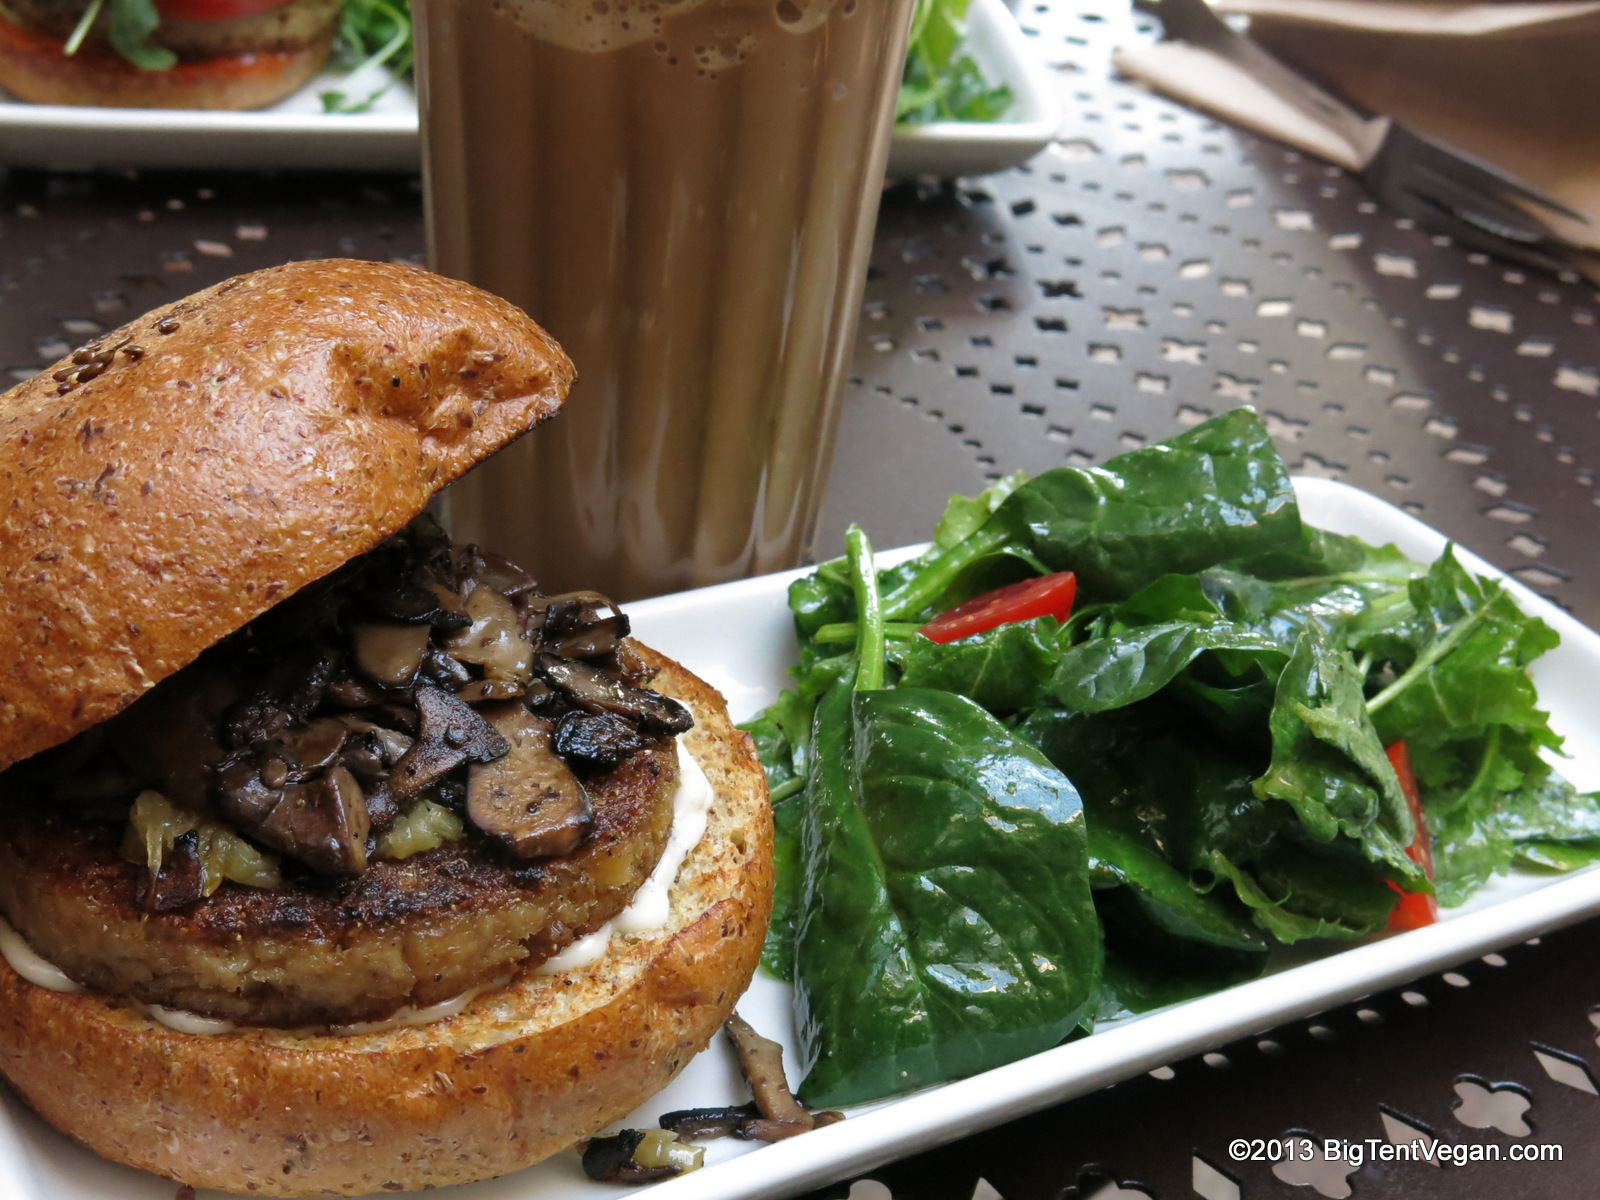 Truffle Burger with caramelized onions, sautéed mushrooms, and truffle aioli